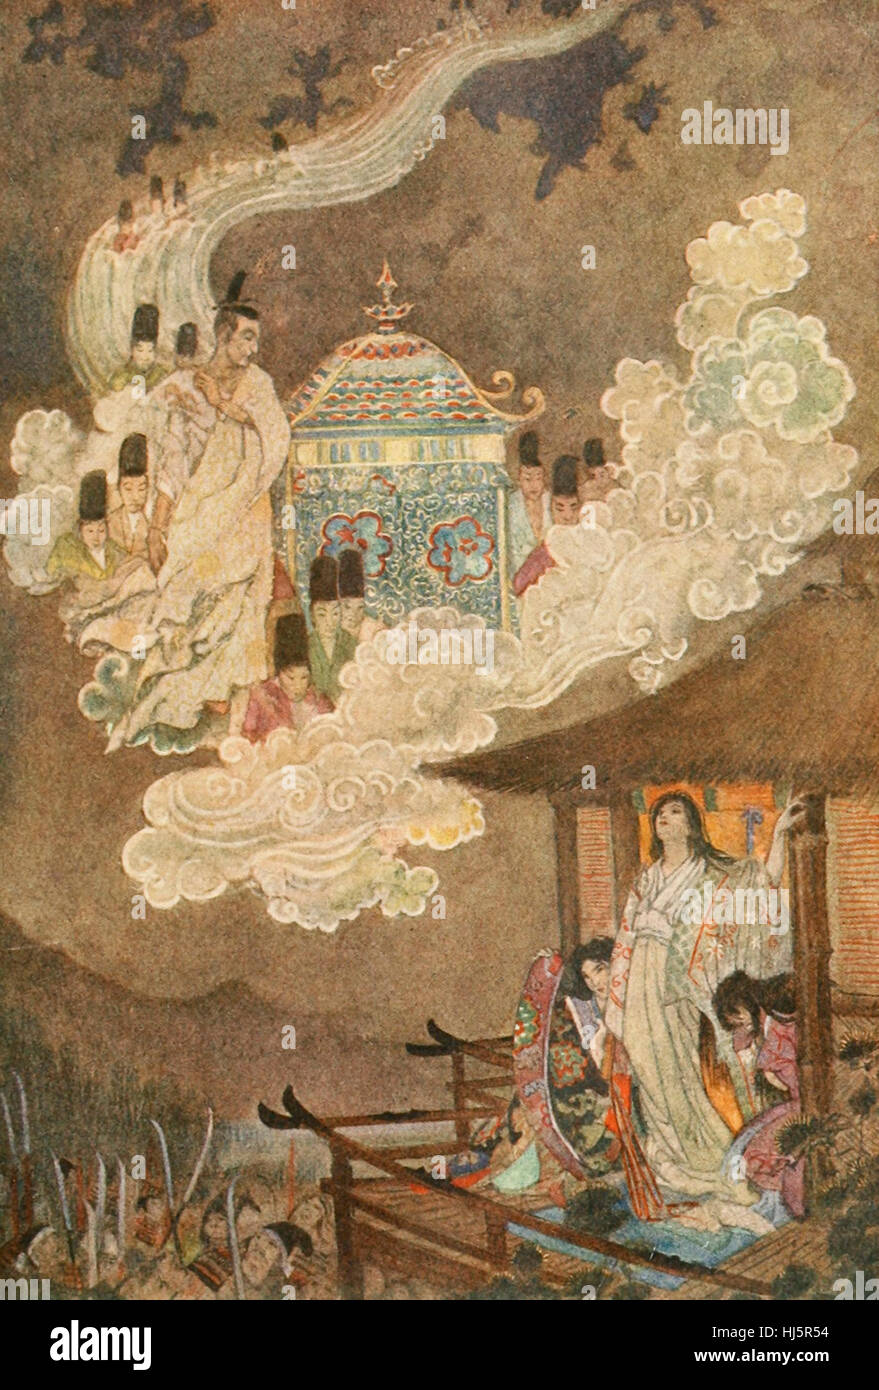 La demanda Moonfolk la Señorita Kaguya. Folclore japonés Imagen De Stock